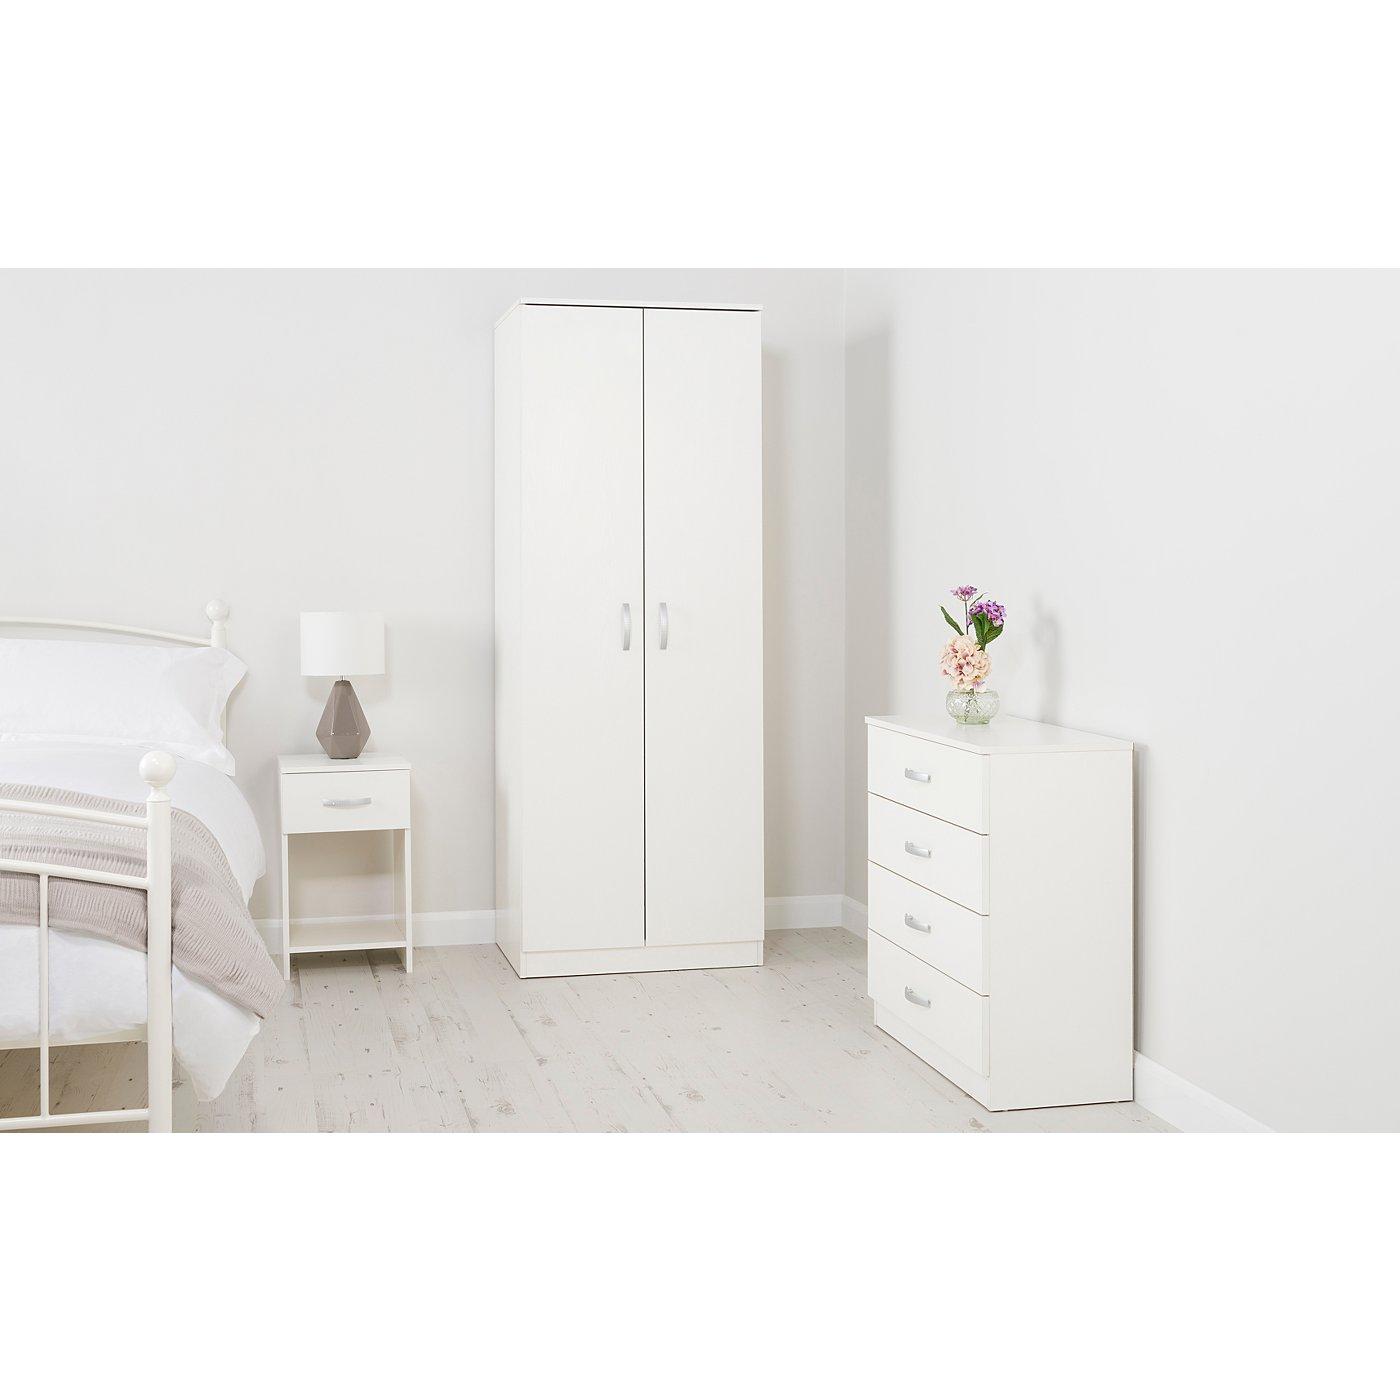 George Home Marlow Bedroom Furniture Range   White Ash Effect  Loading zoom. George Home Marlow Bedroom Furniture Range   White Ash Effect